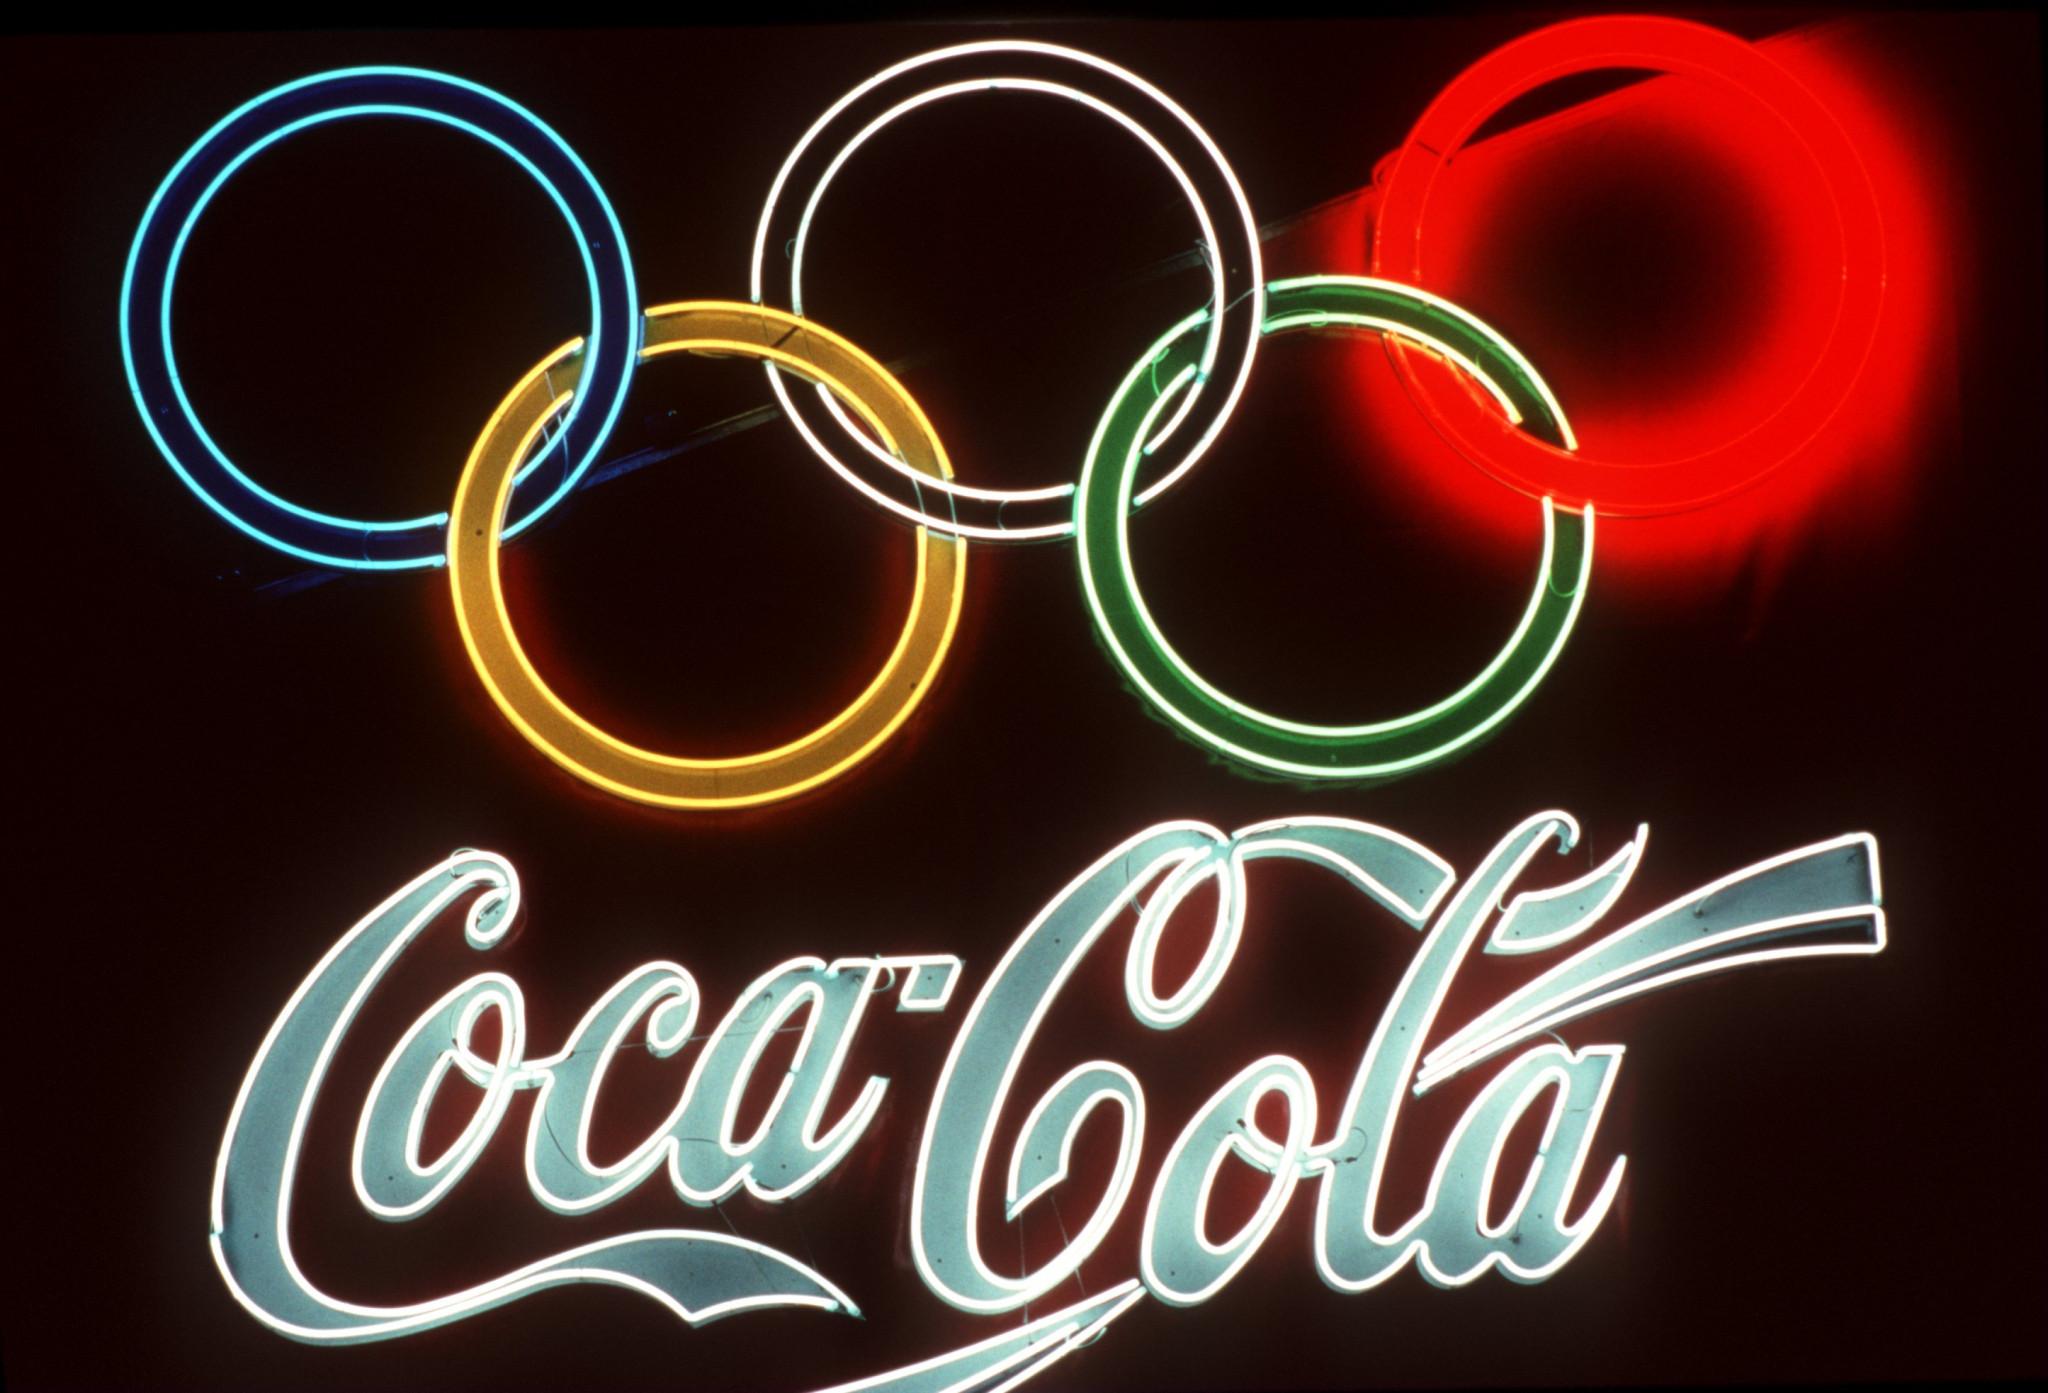 Longest-standing Olympic sponsor Coca-Cola suffers steep revenue decline